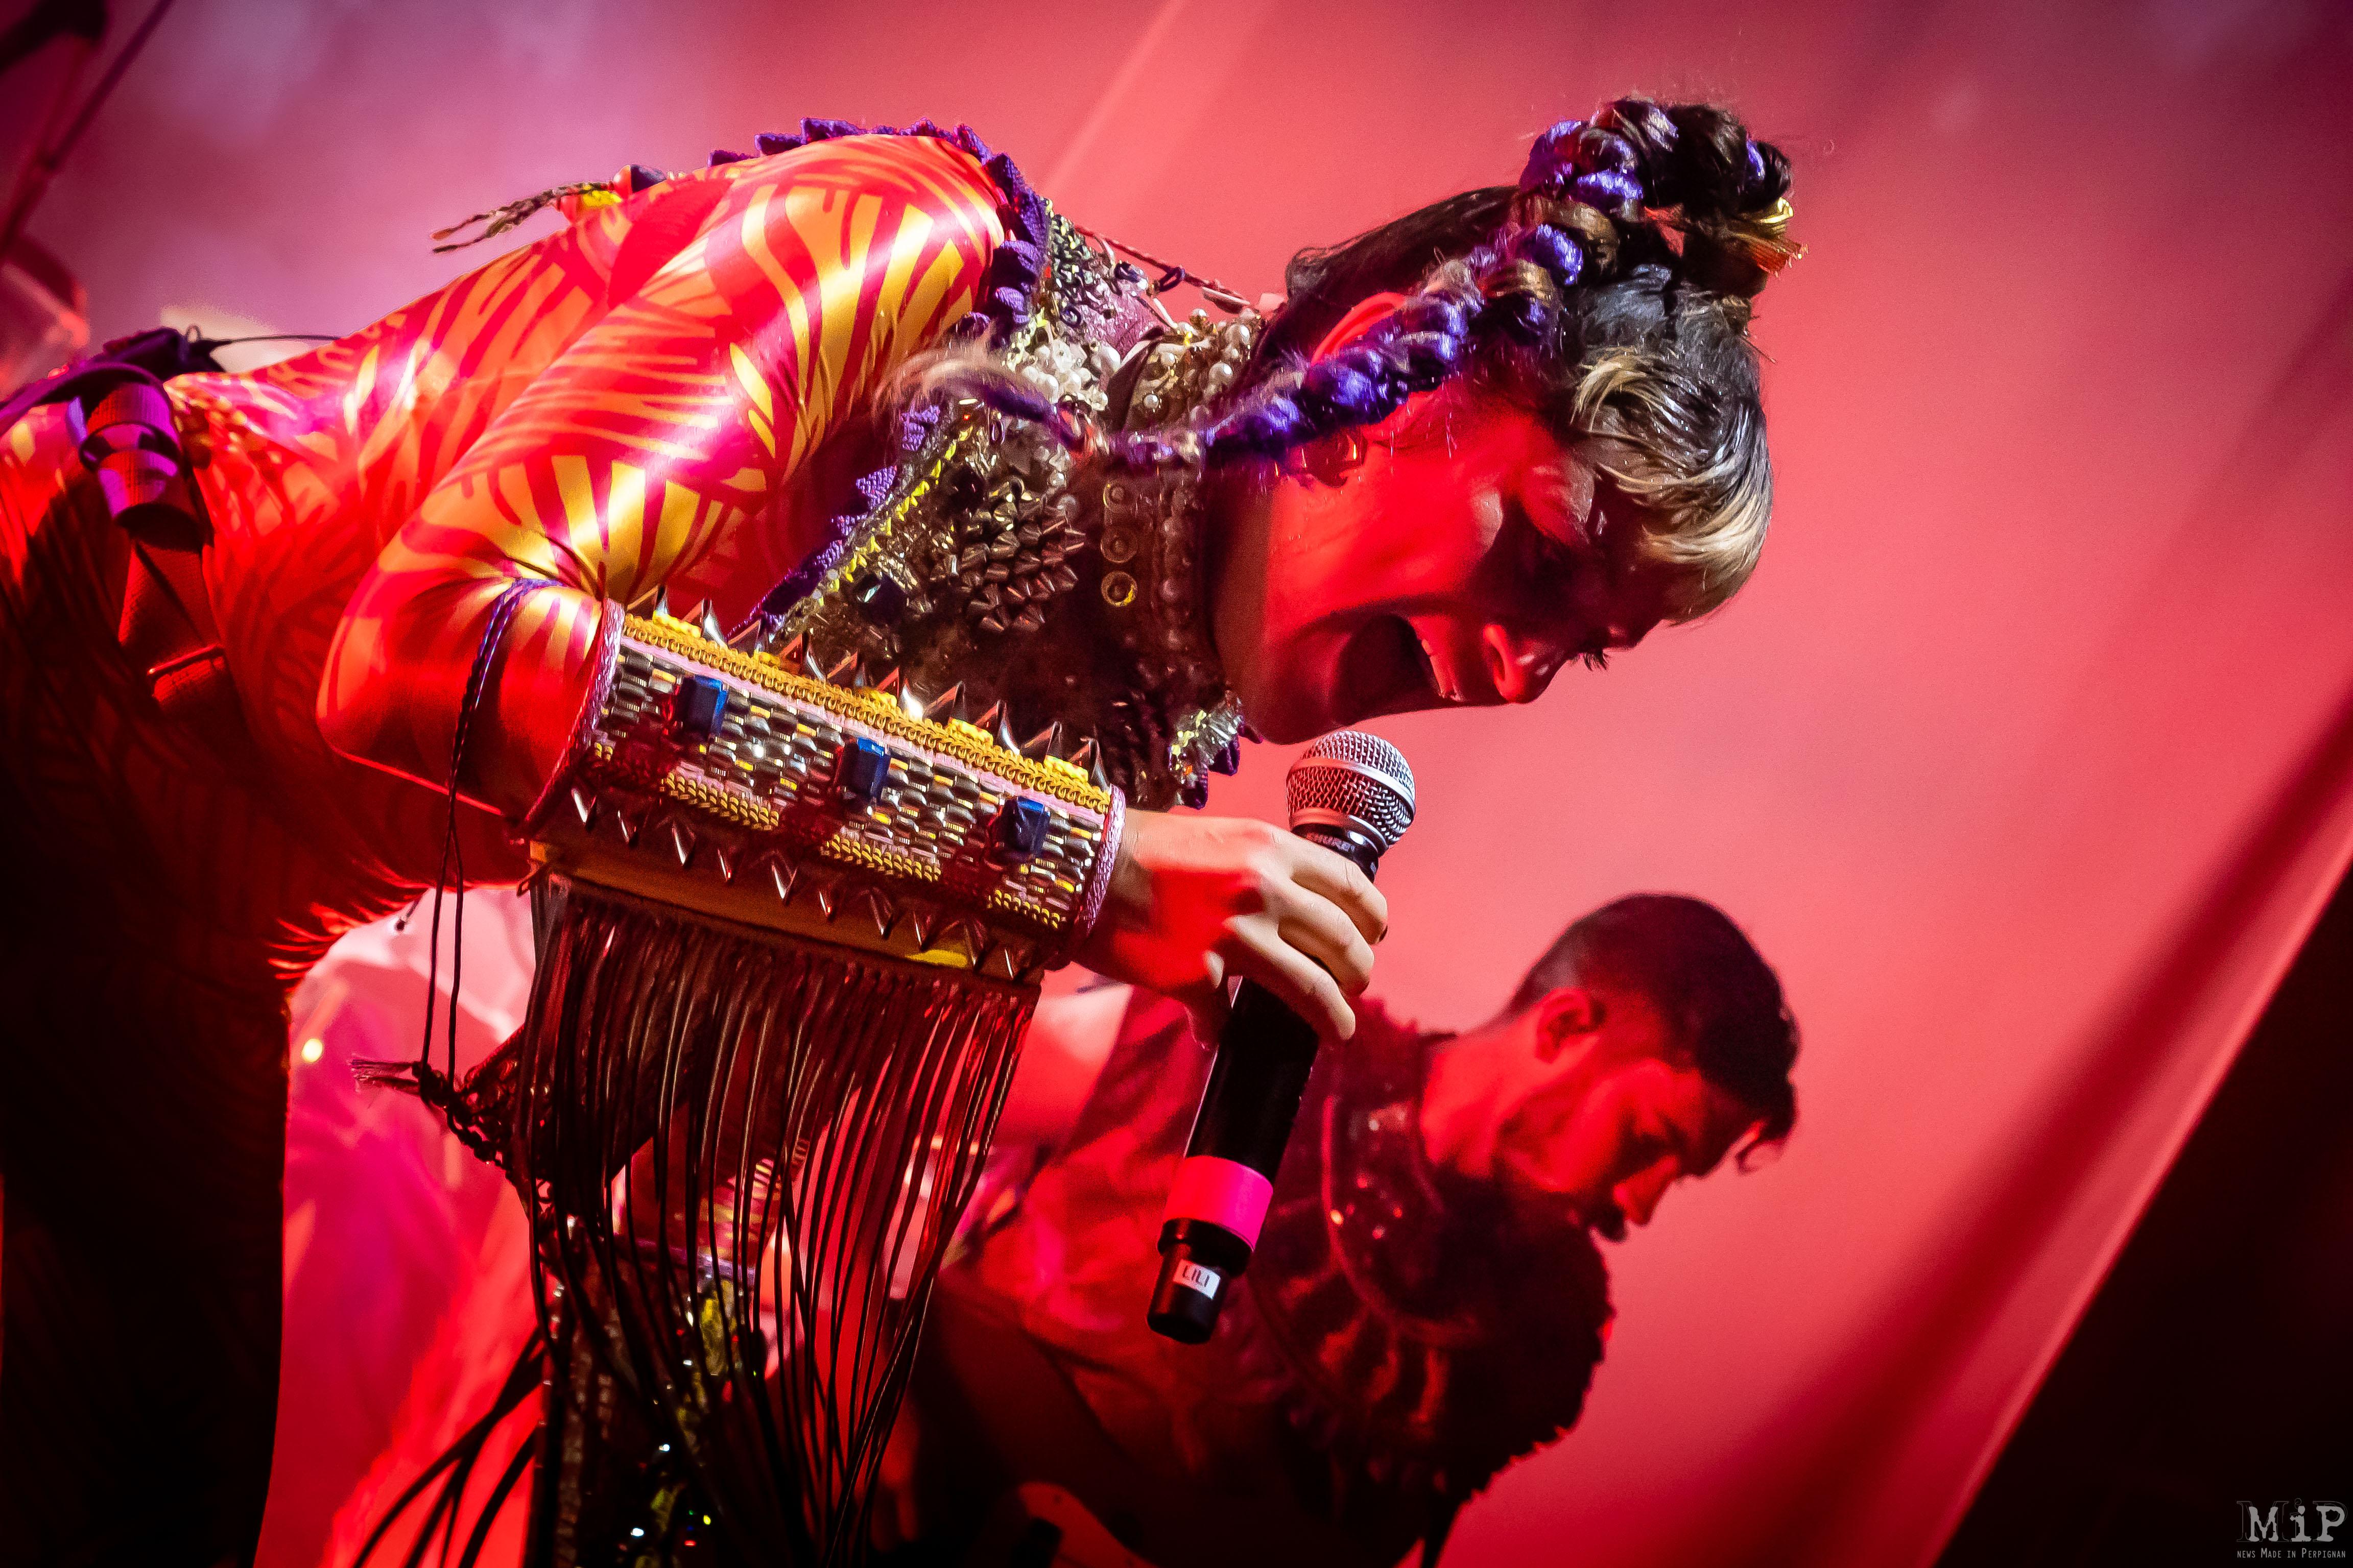 Deluxe Concert El Mediator Perpignan 2019 Tournée Boys and Girl Egoraphobia